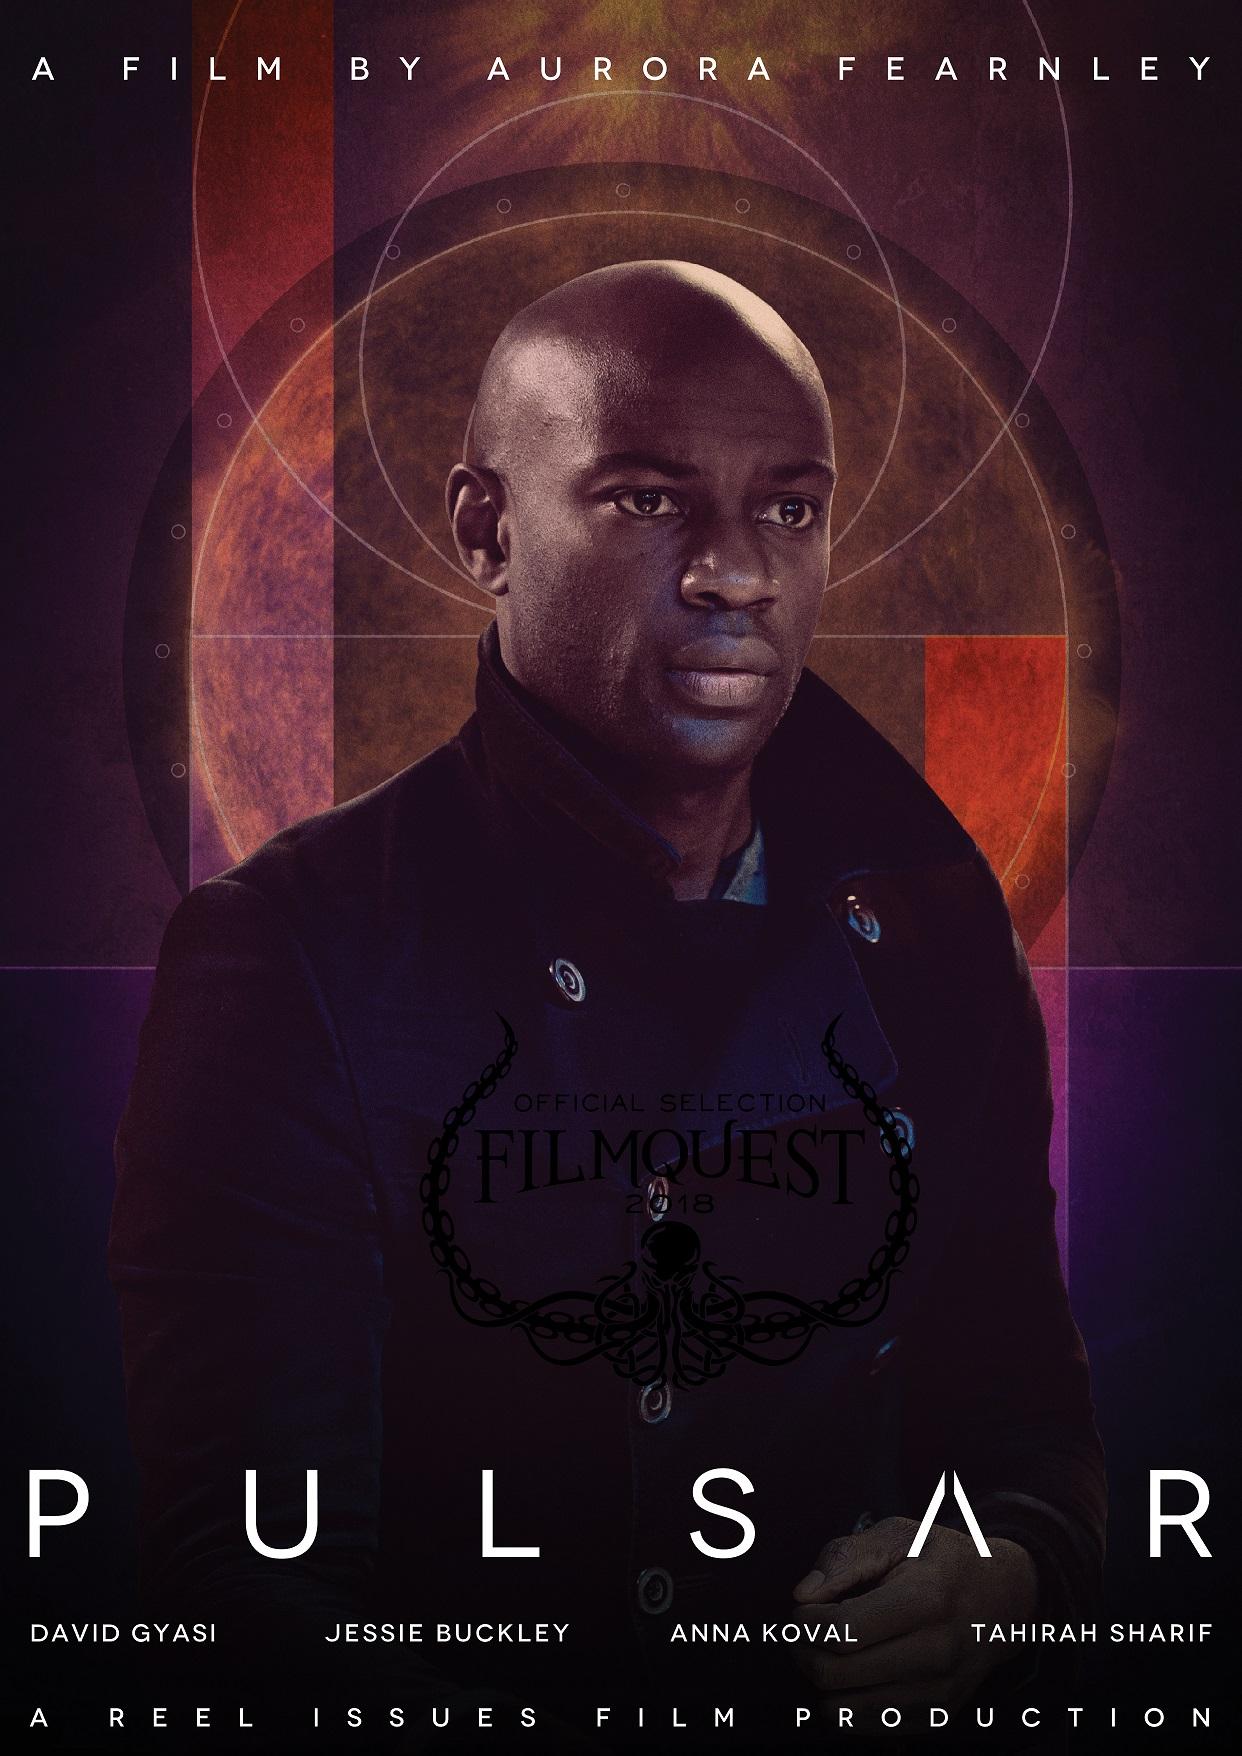 Pulsar poster (featuring David Gyasi)